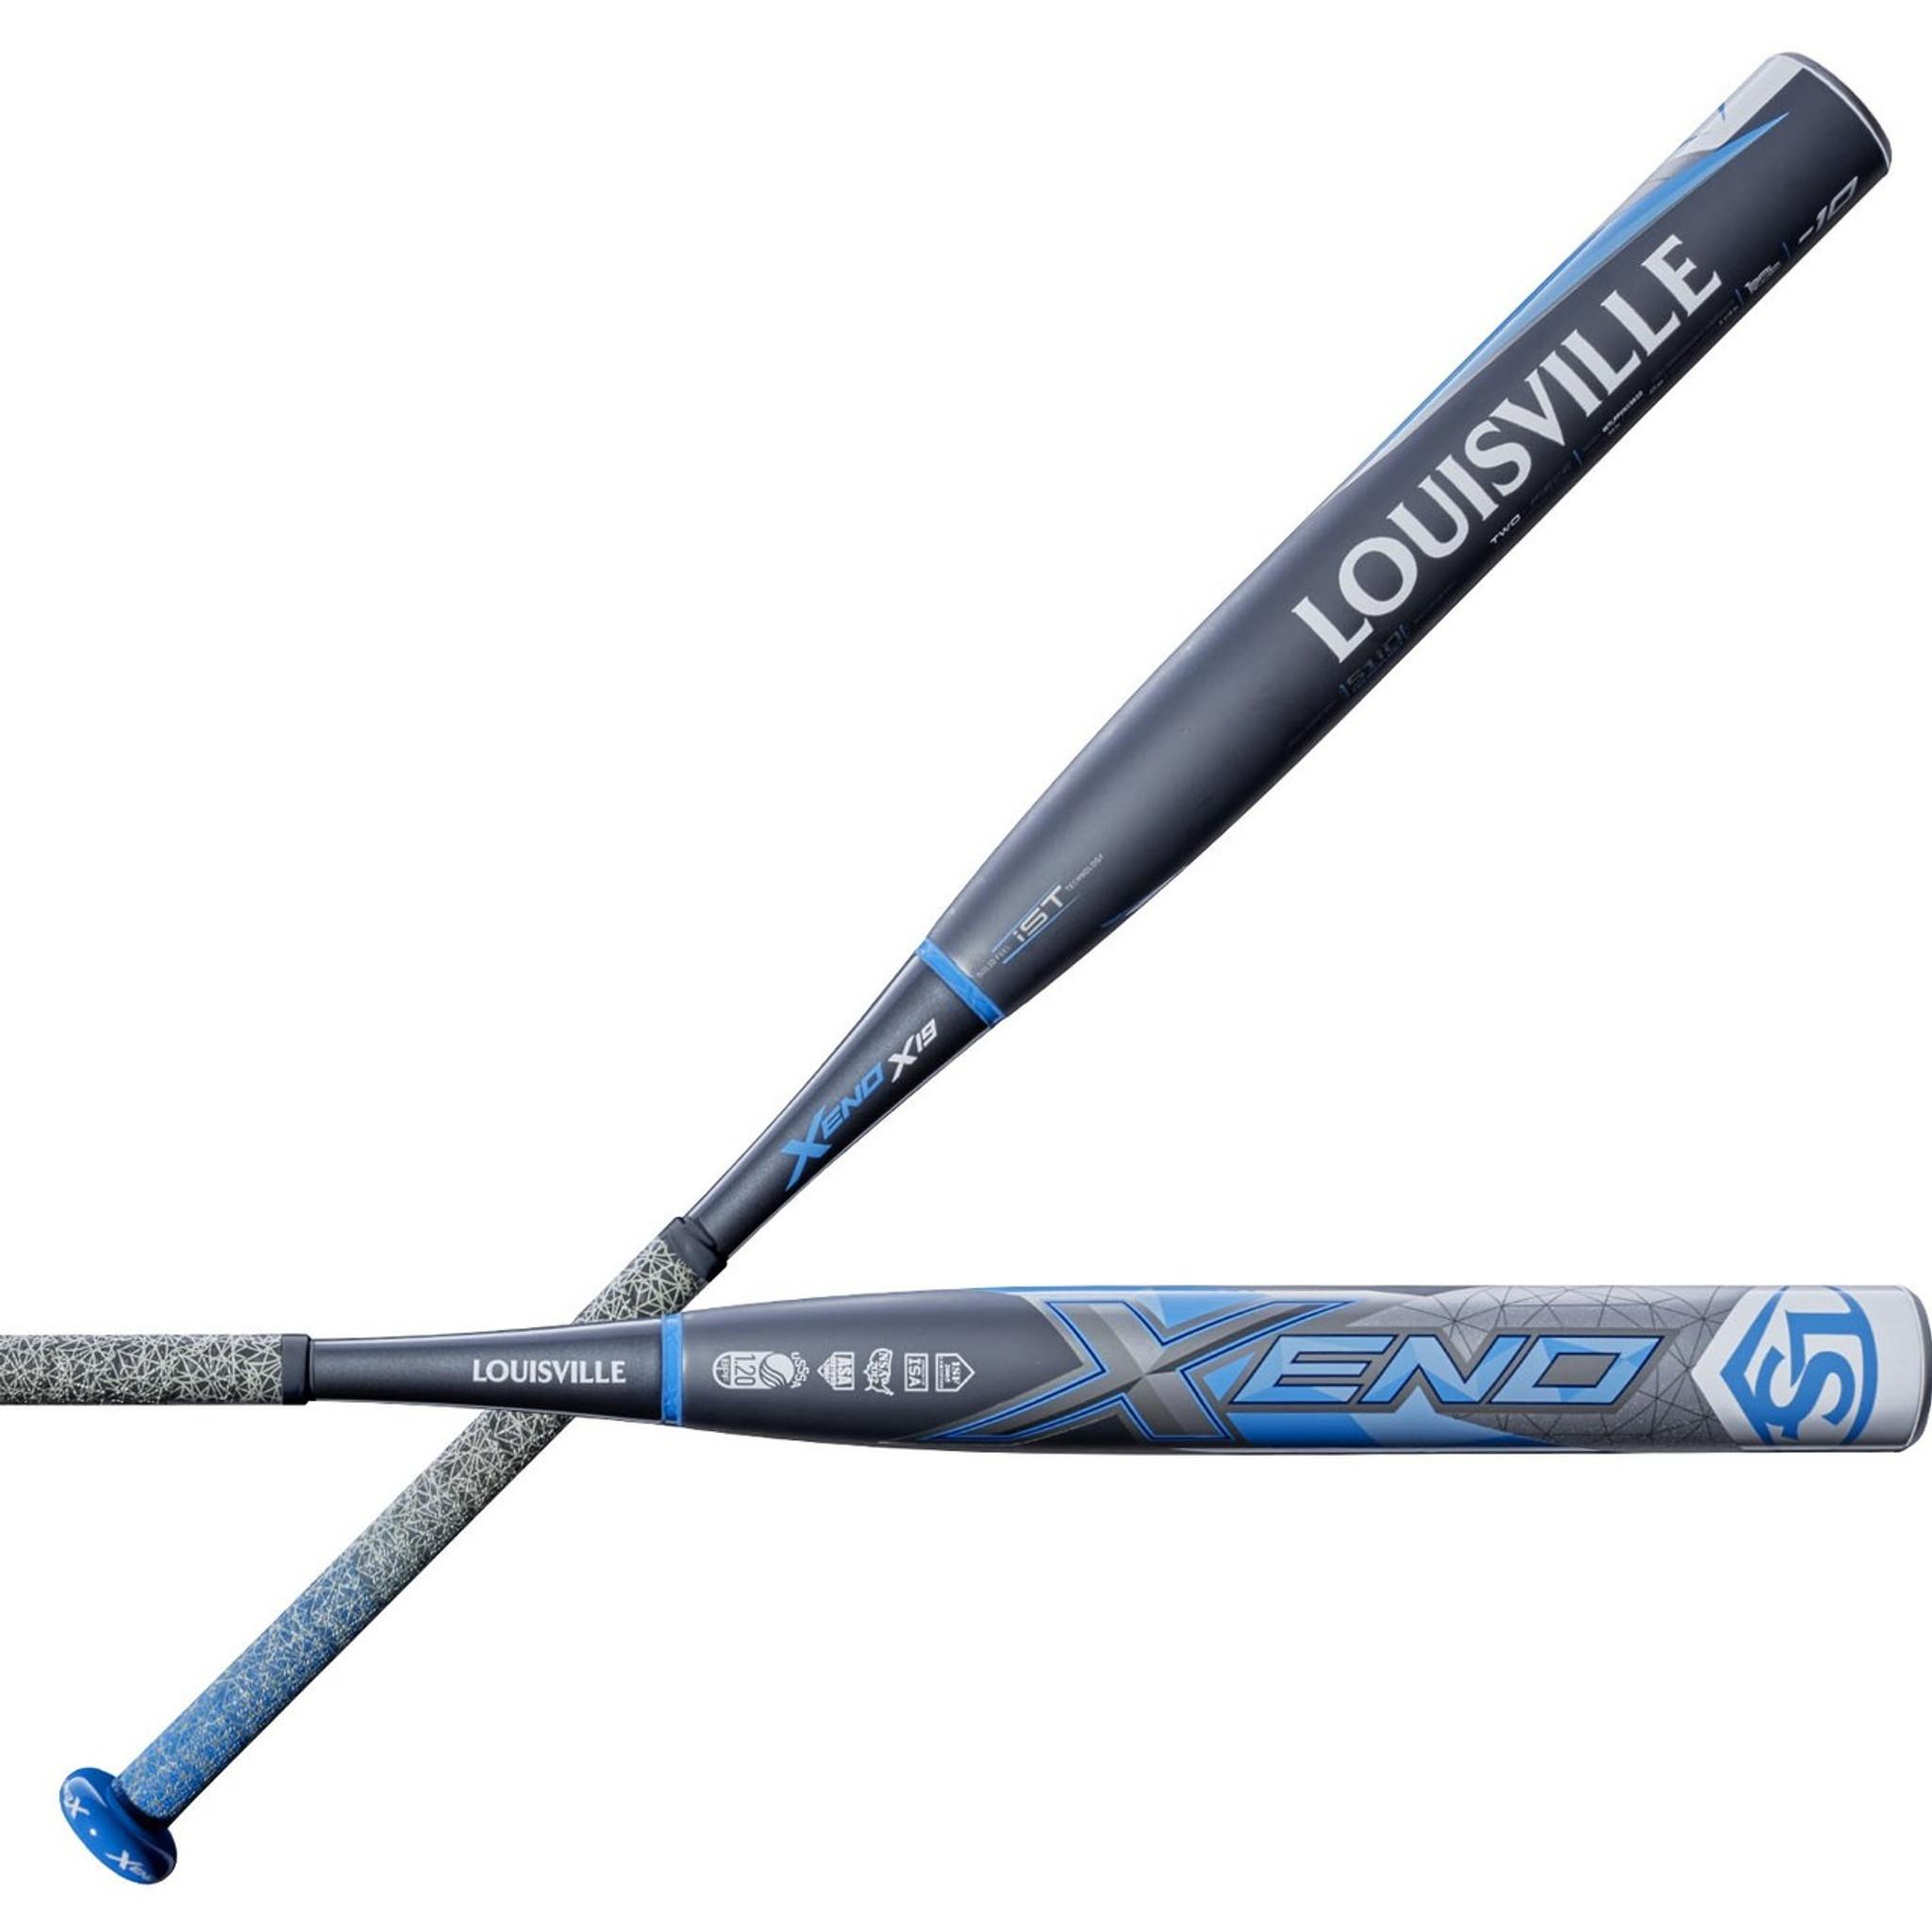 f087d1403ce 2019 Louisville Slugger Xeno -10 Fastpitch Softball Bat WTLFPXN19A10 ...